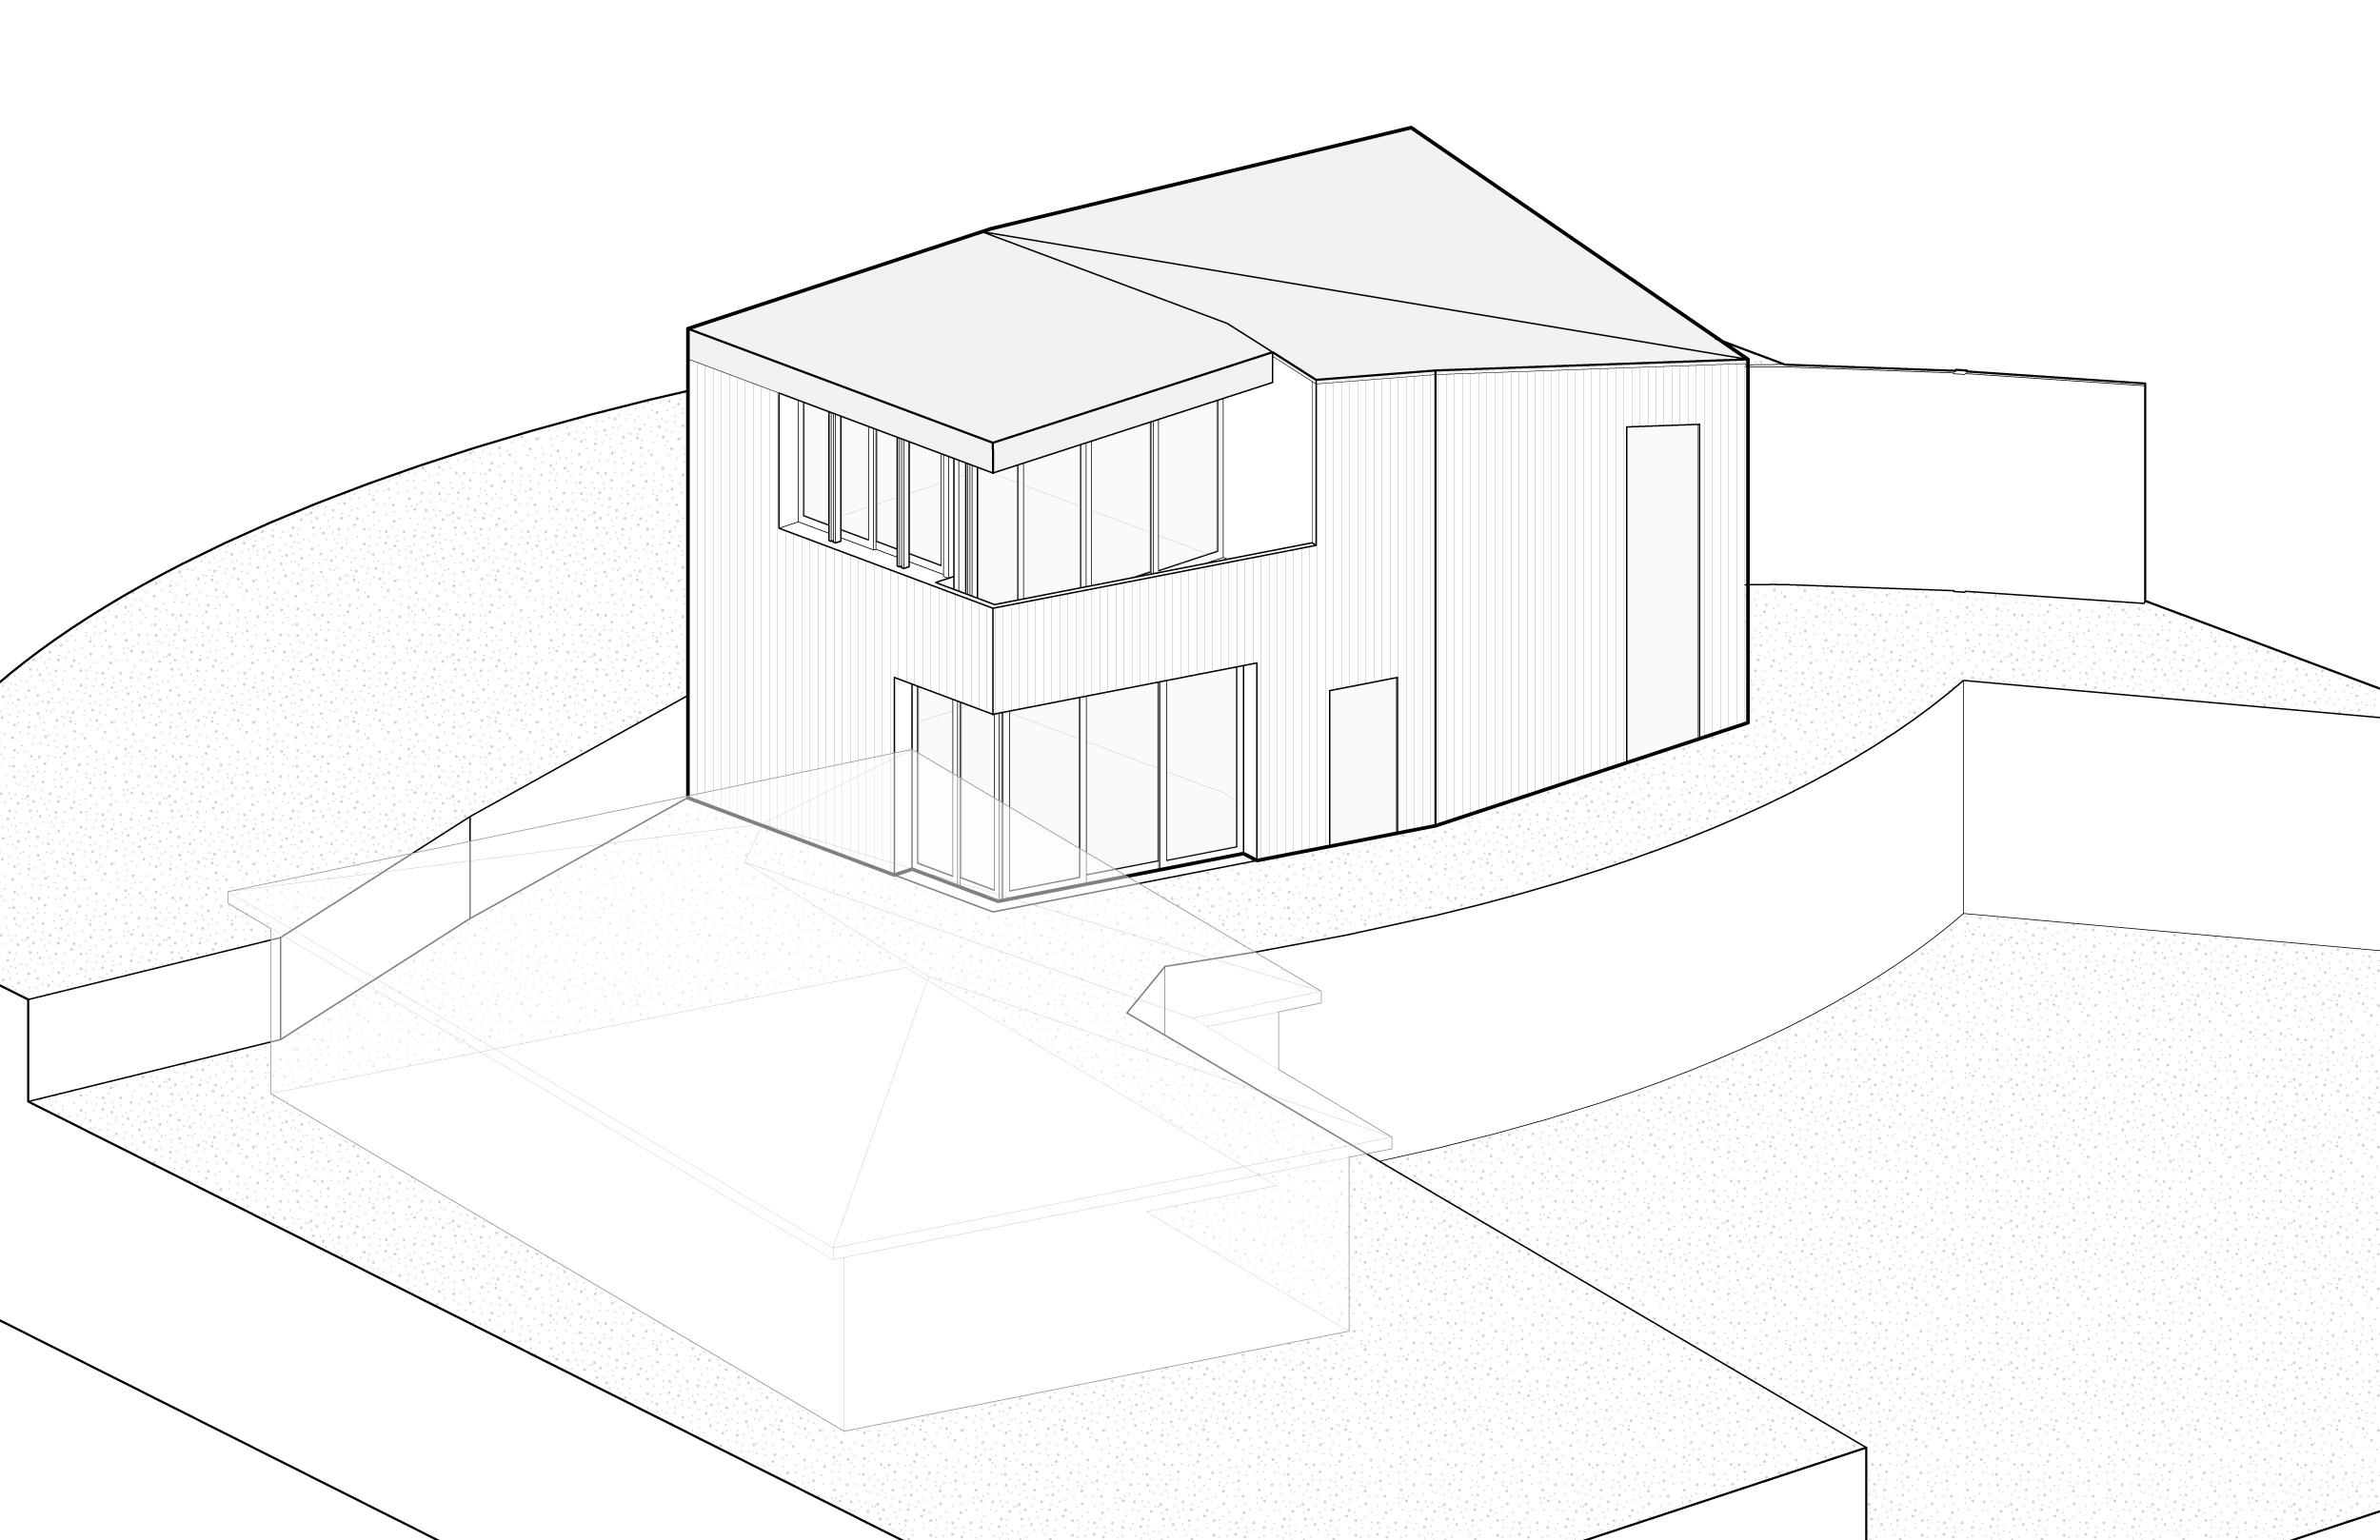 La-Cuesta-House_Diagram_07.jpg